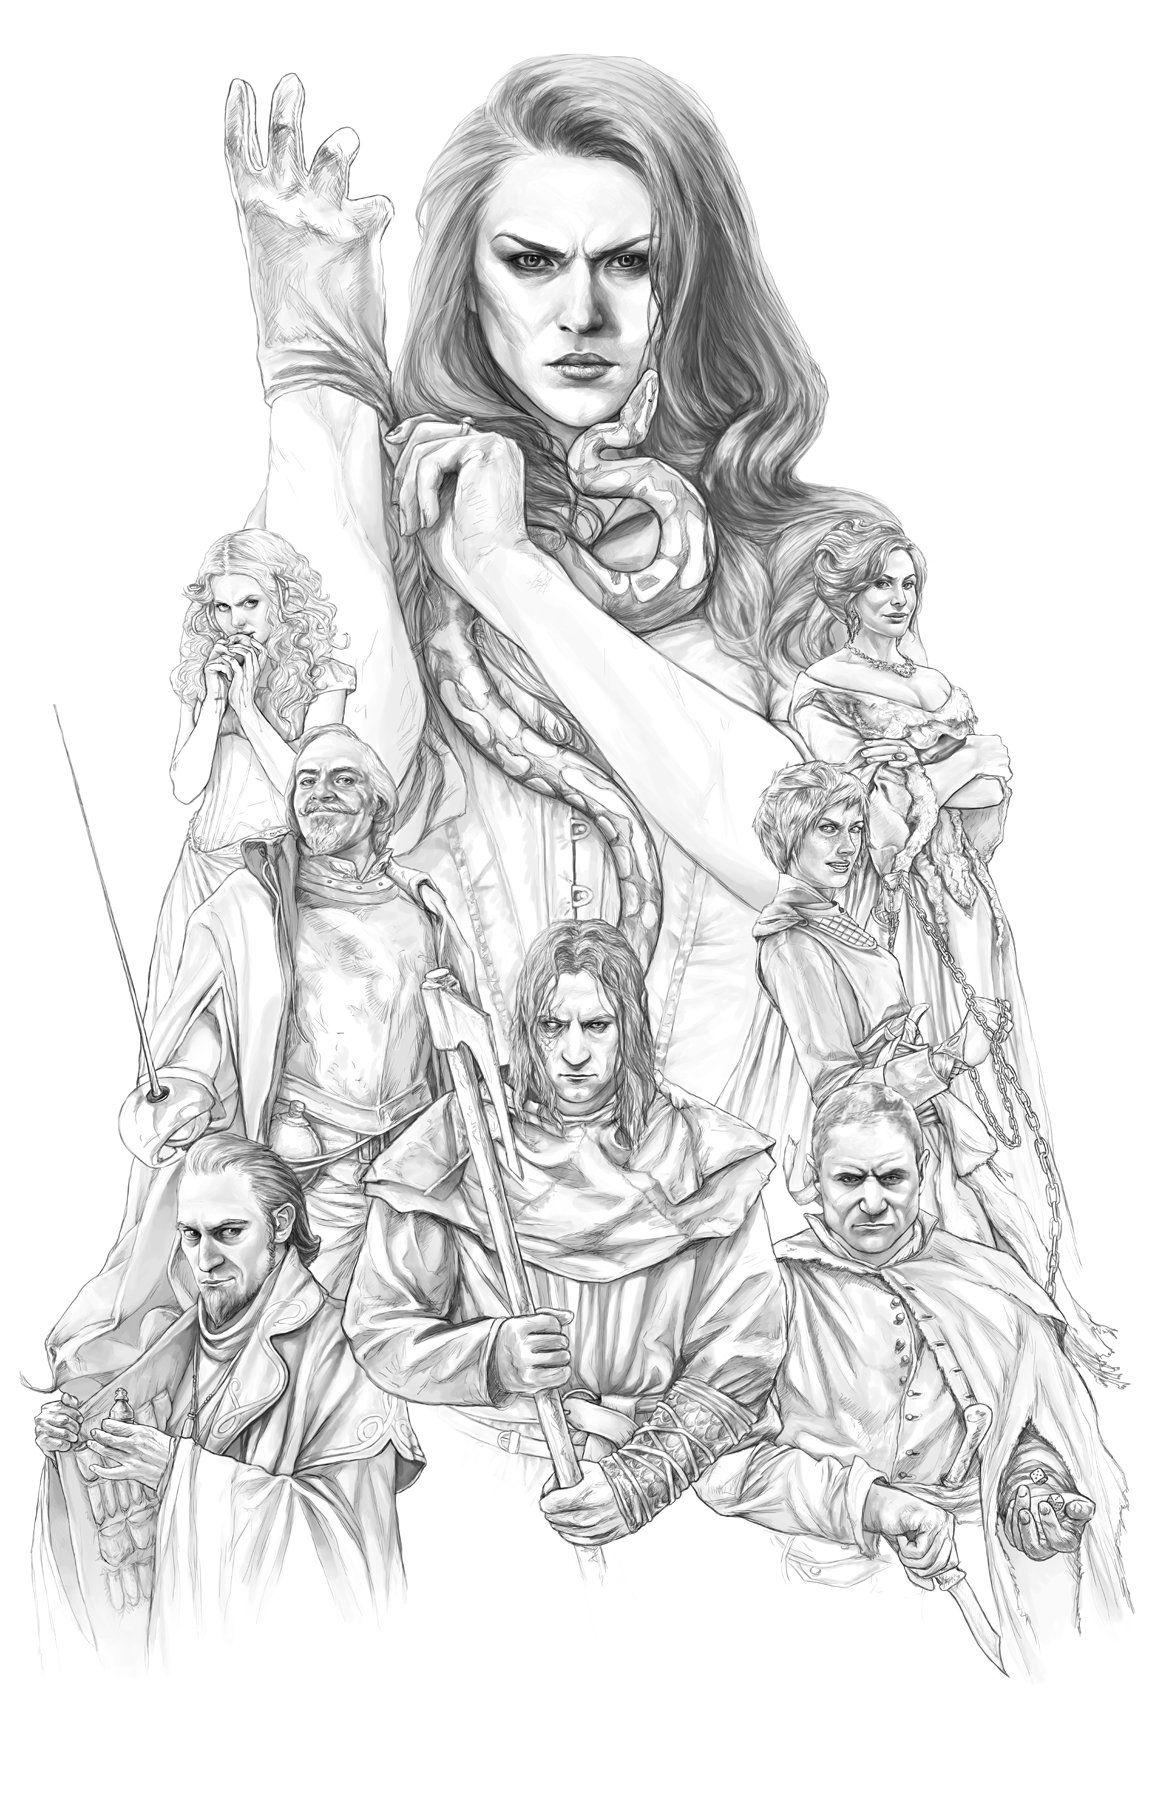 Best Served Cold, Darya Kuznetsova | Character art, Art, Female character  design